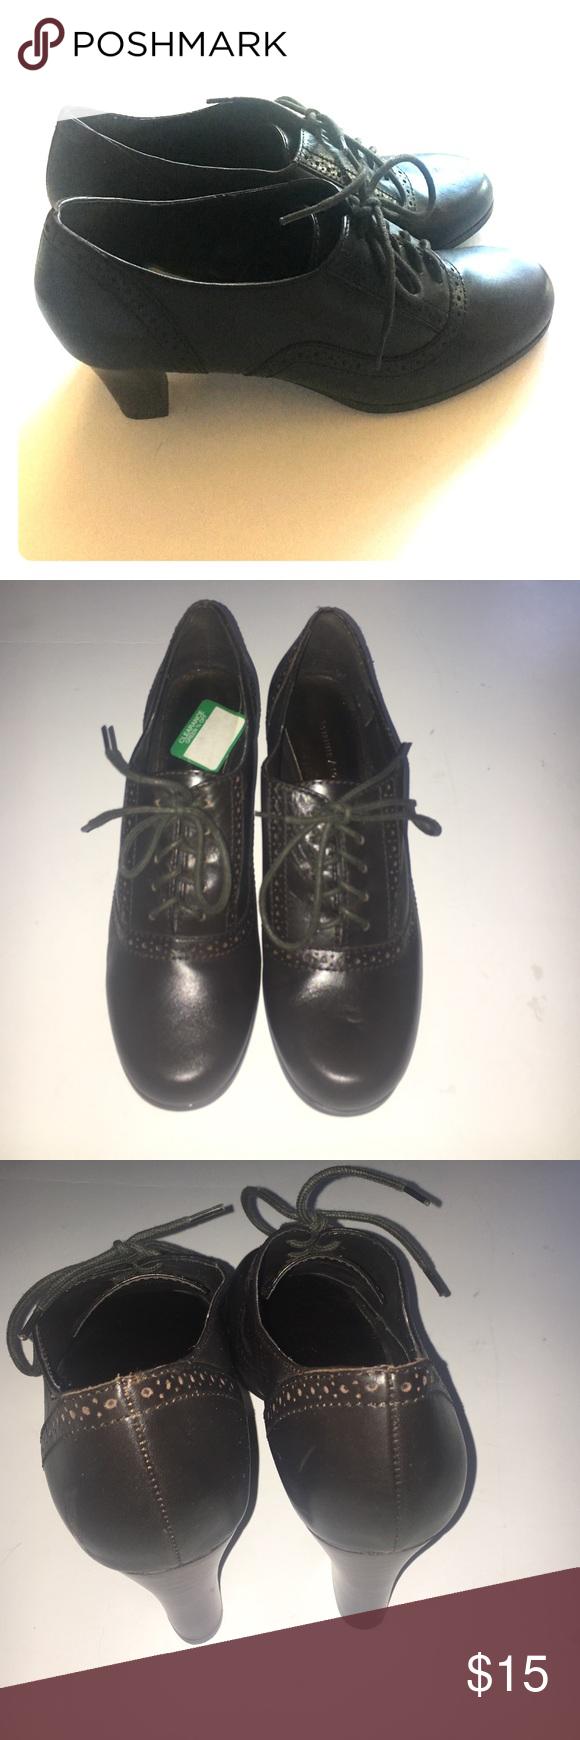 "Etienne Aigner Raleigh Shoes - Size 9M Unworn. Great shape. 3"" high heels. Brown Color. Etienne Aigner Shoes Mules & Clogs"